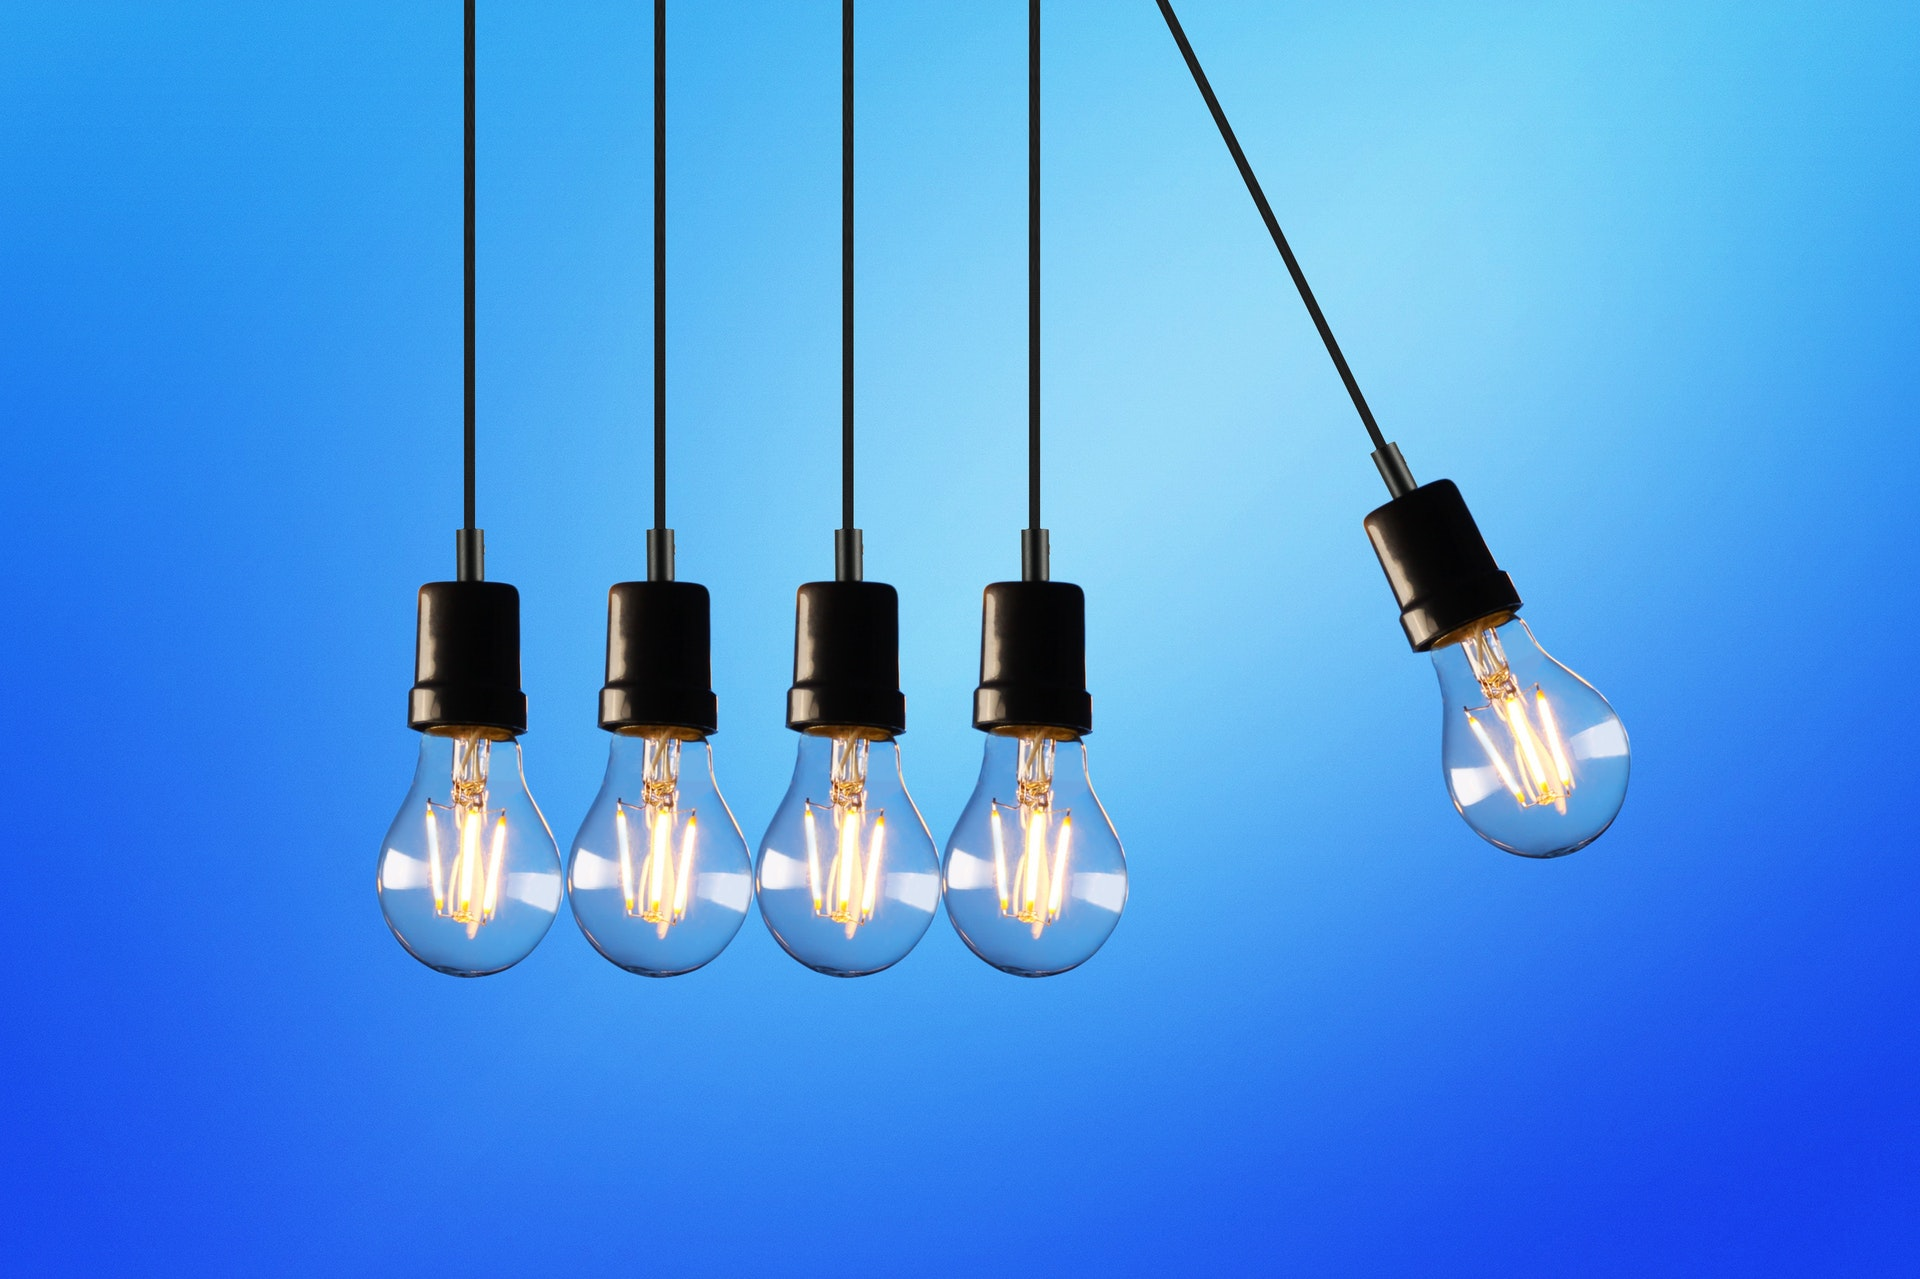 A Newton's cradle made of lightbulbs